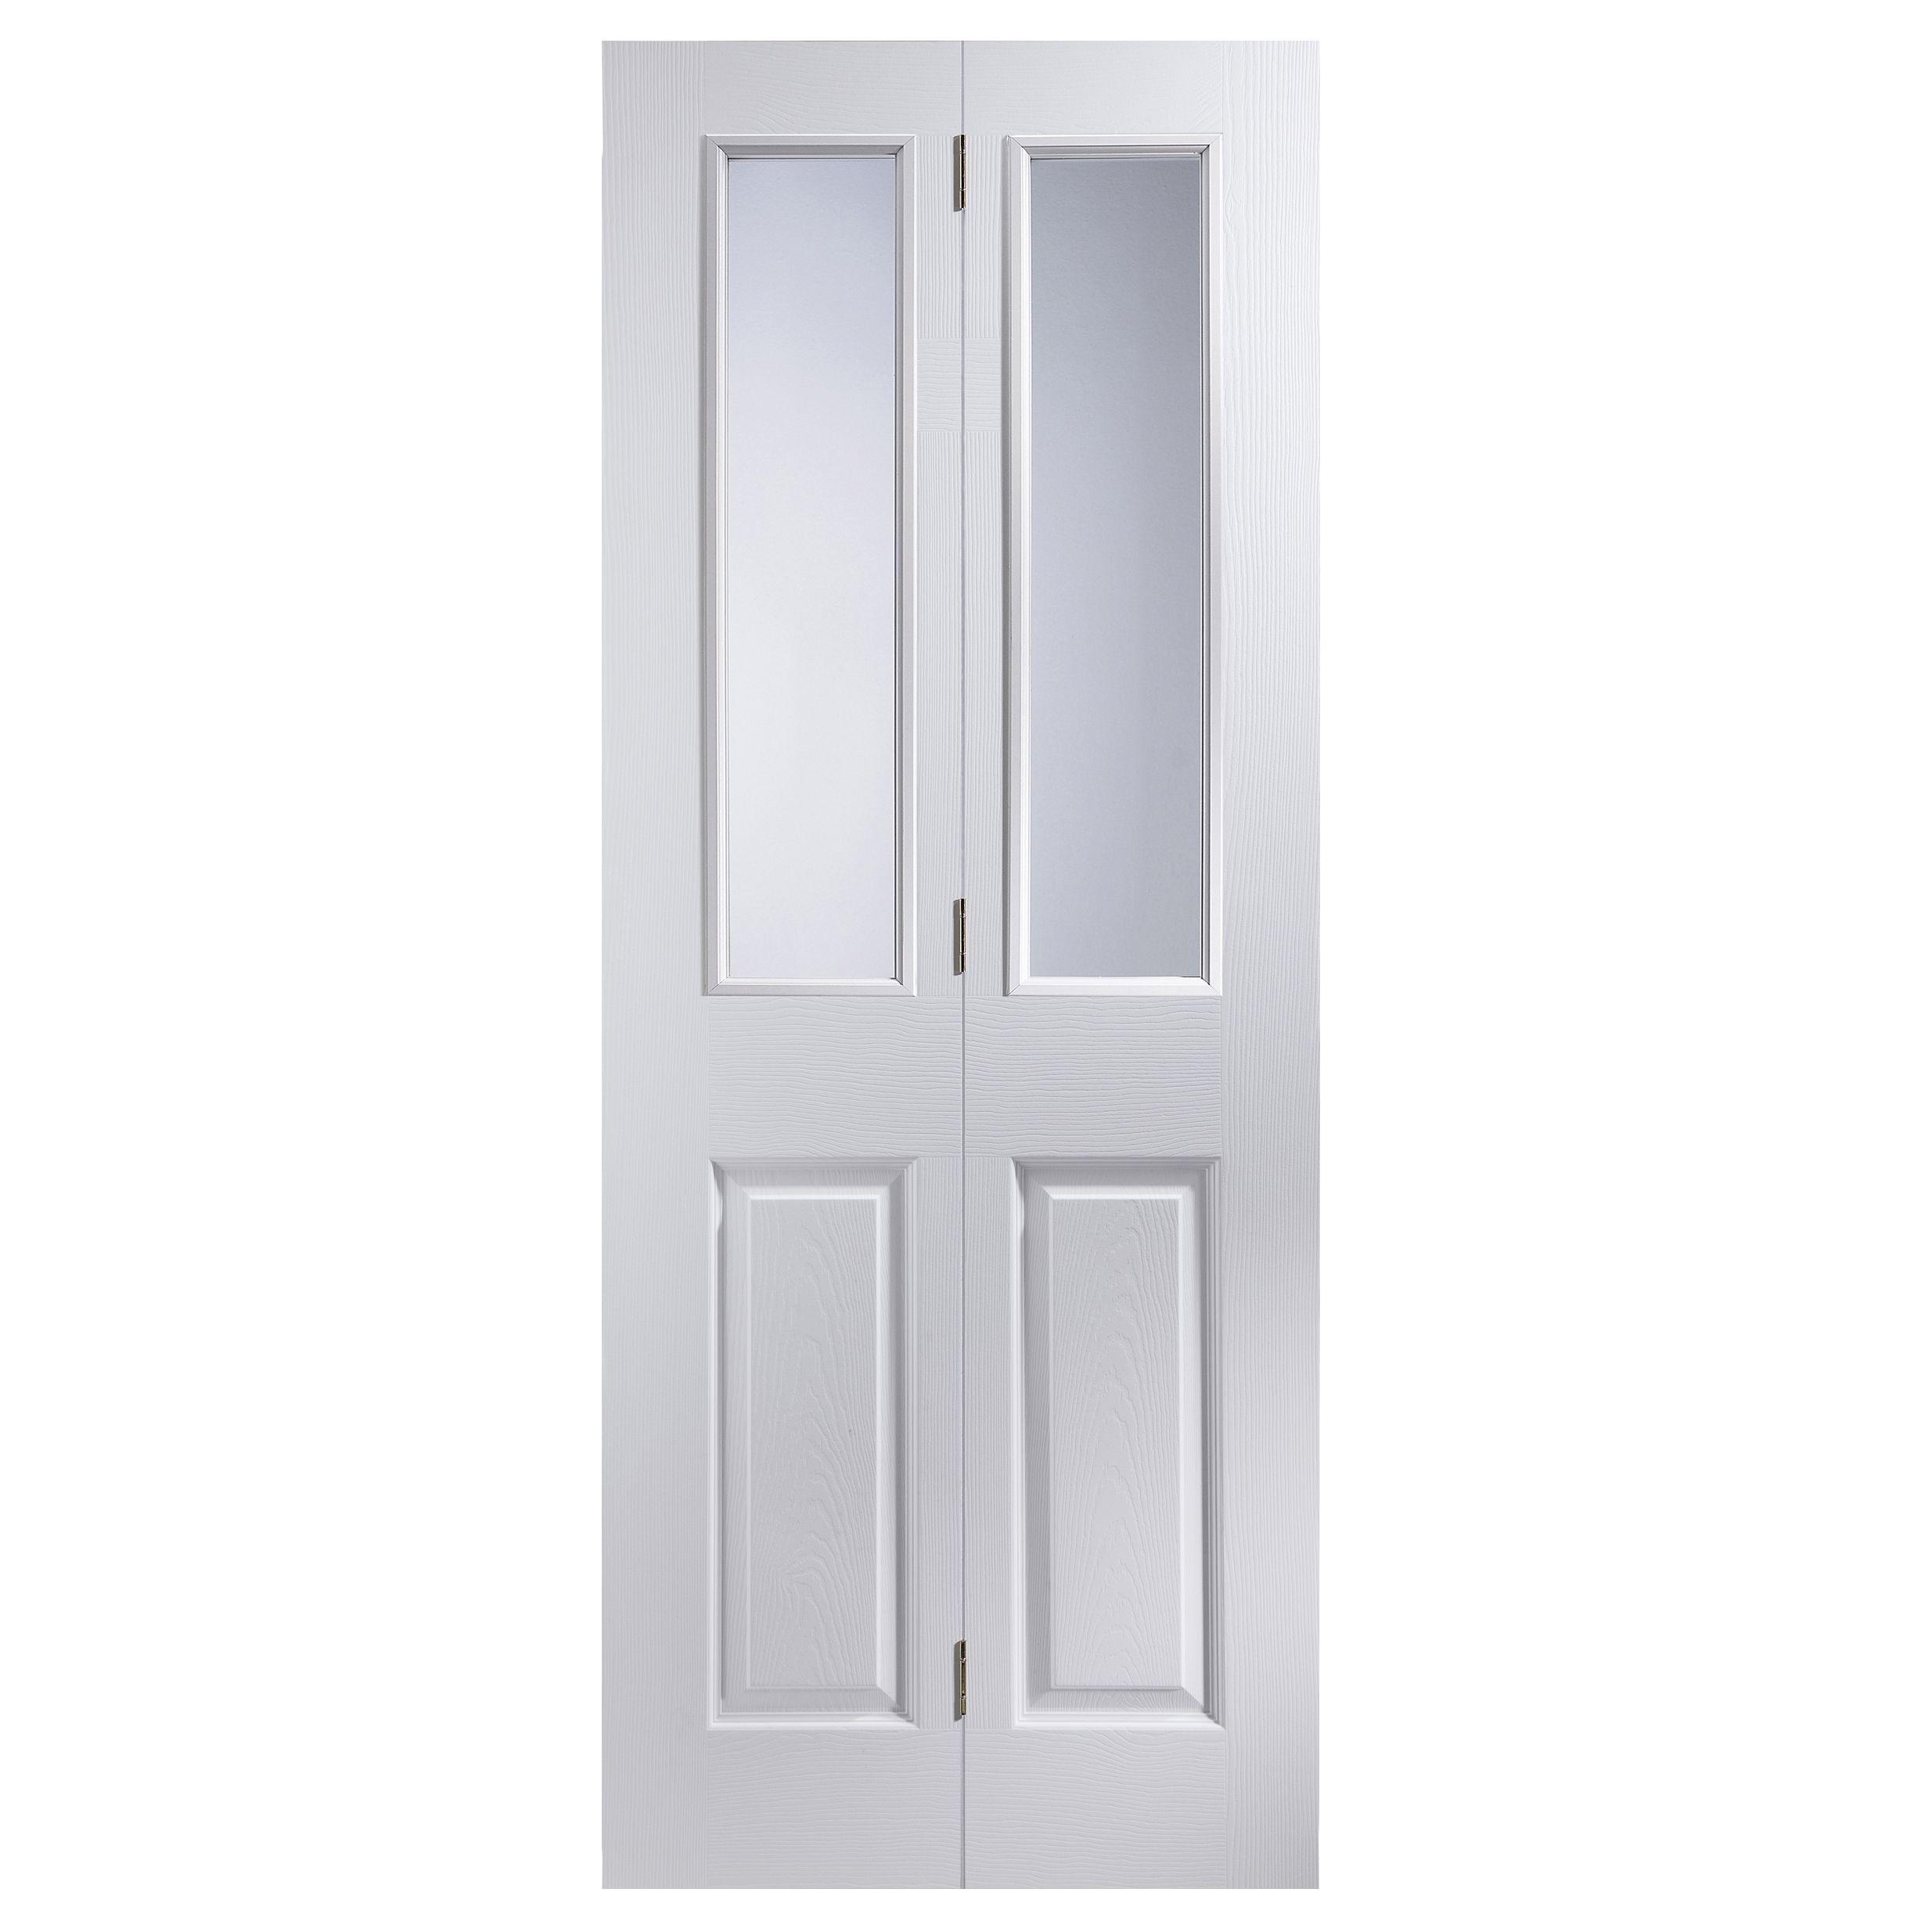 4 Panel 2 Lite Primed Woodgrain Effect Glazed Internal Bi Fold Door